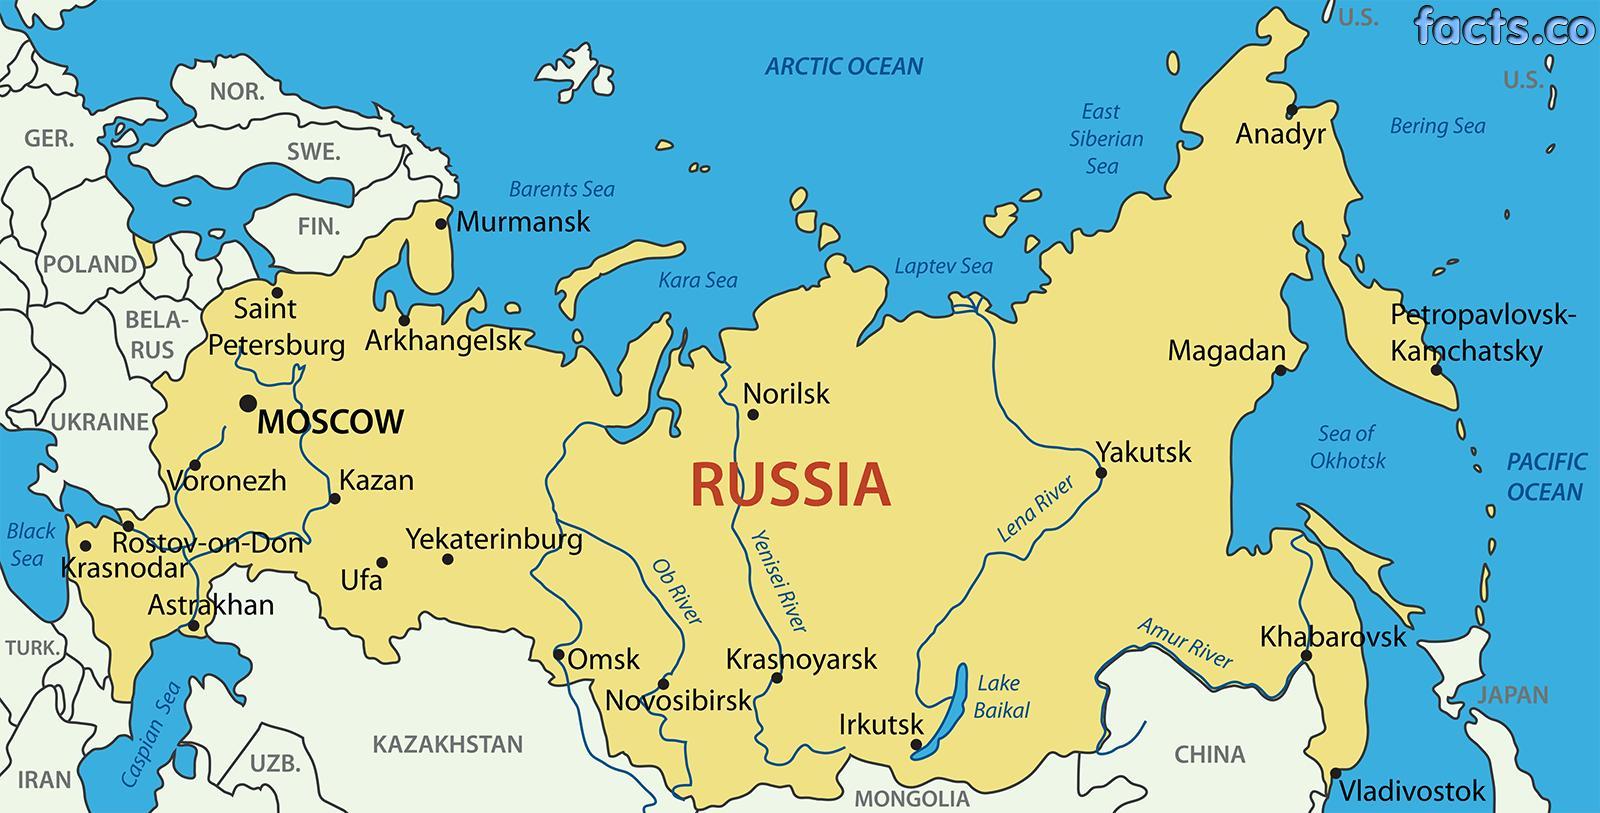 europa kart byer Russland kart byer   Byer i Russland kart (Øst Europa   Europa) europa kart byer